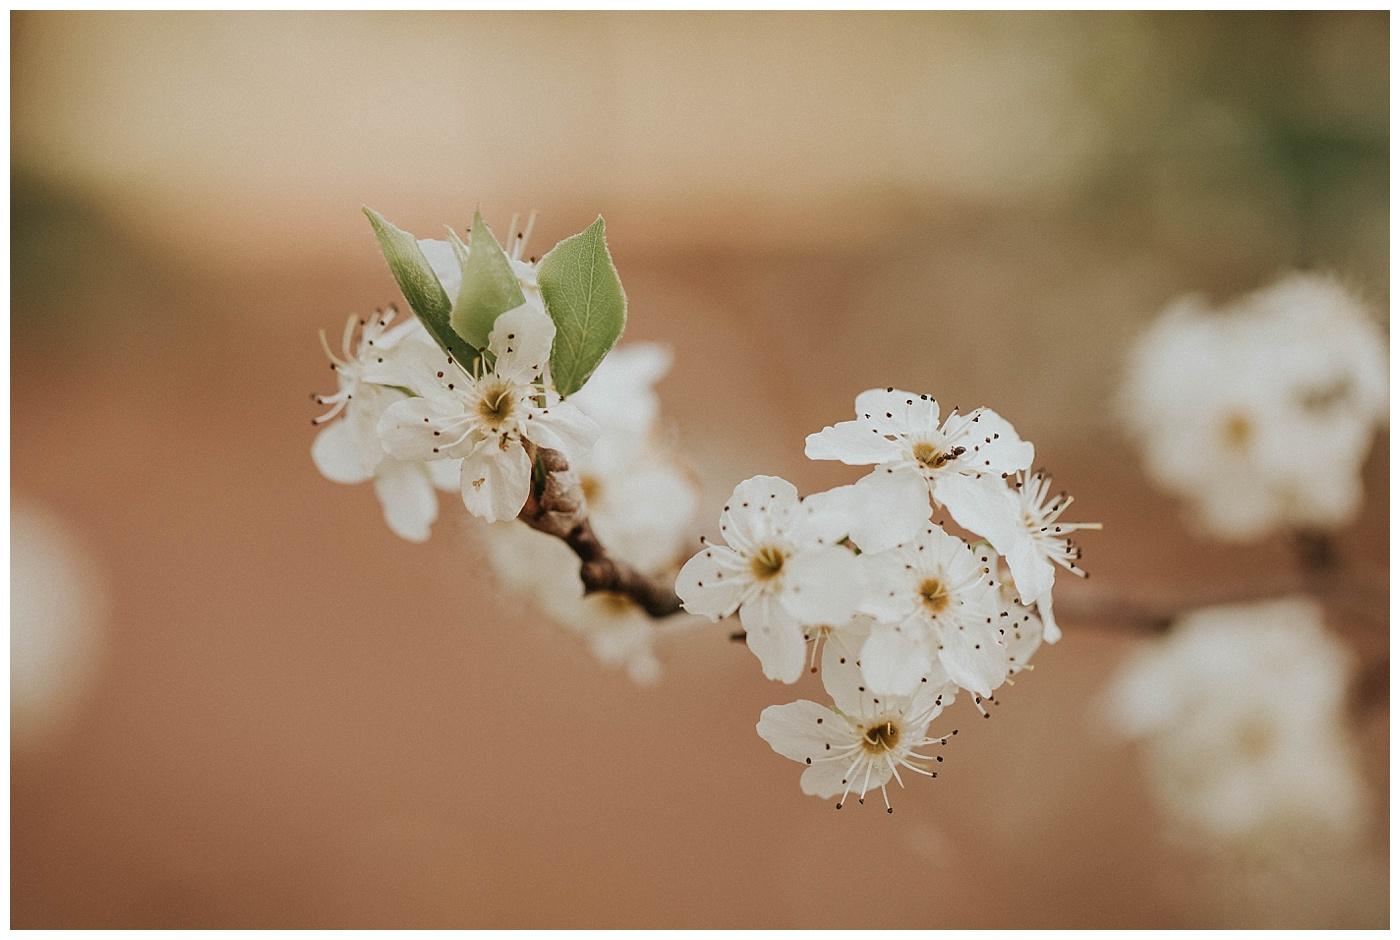 Flowers at Araluen Botanic Gardens, Perth